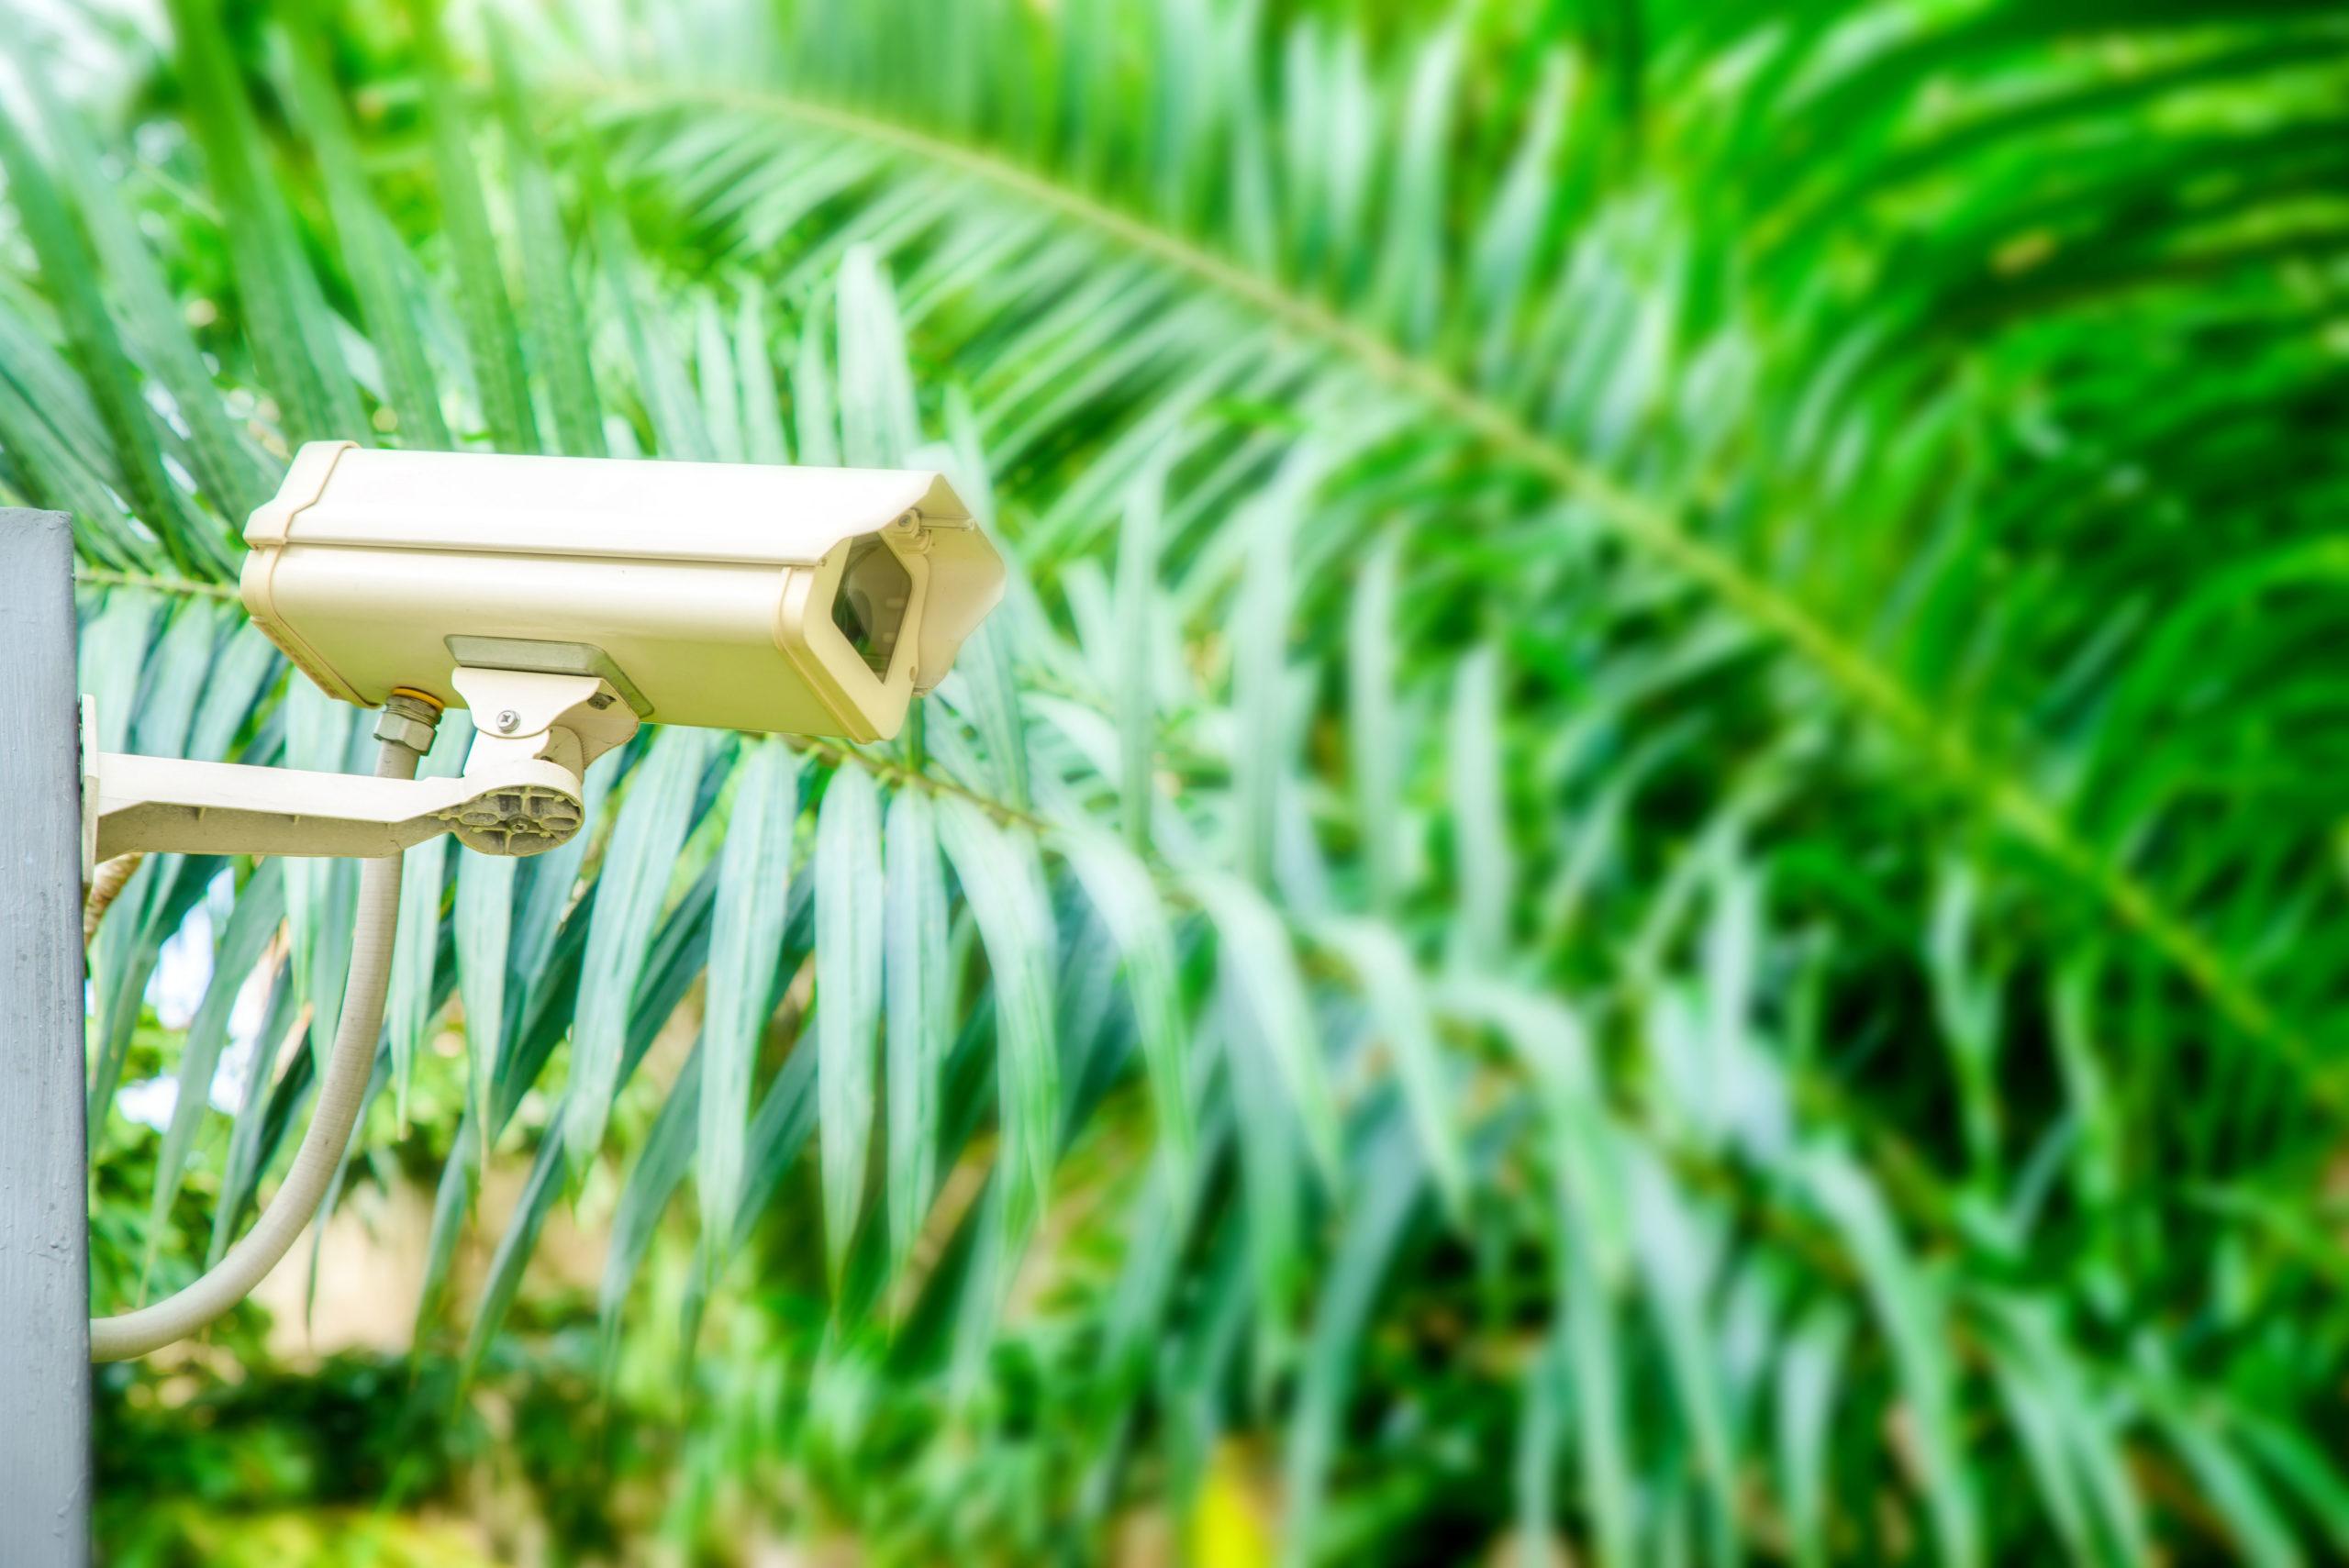 CCTV-scaled